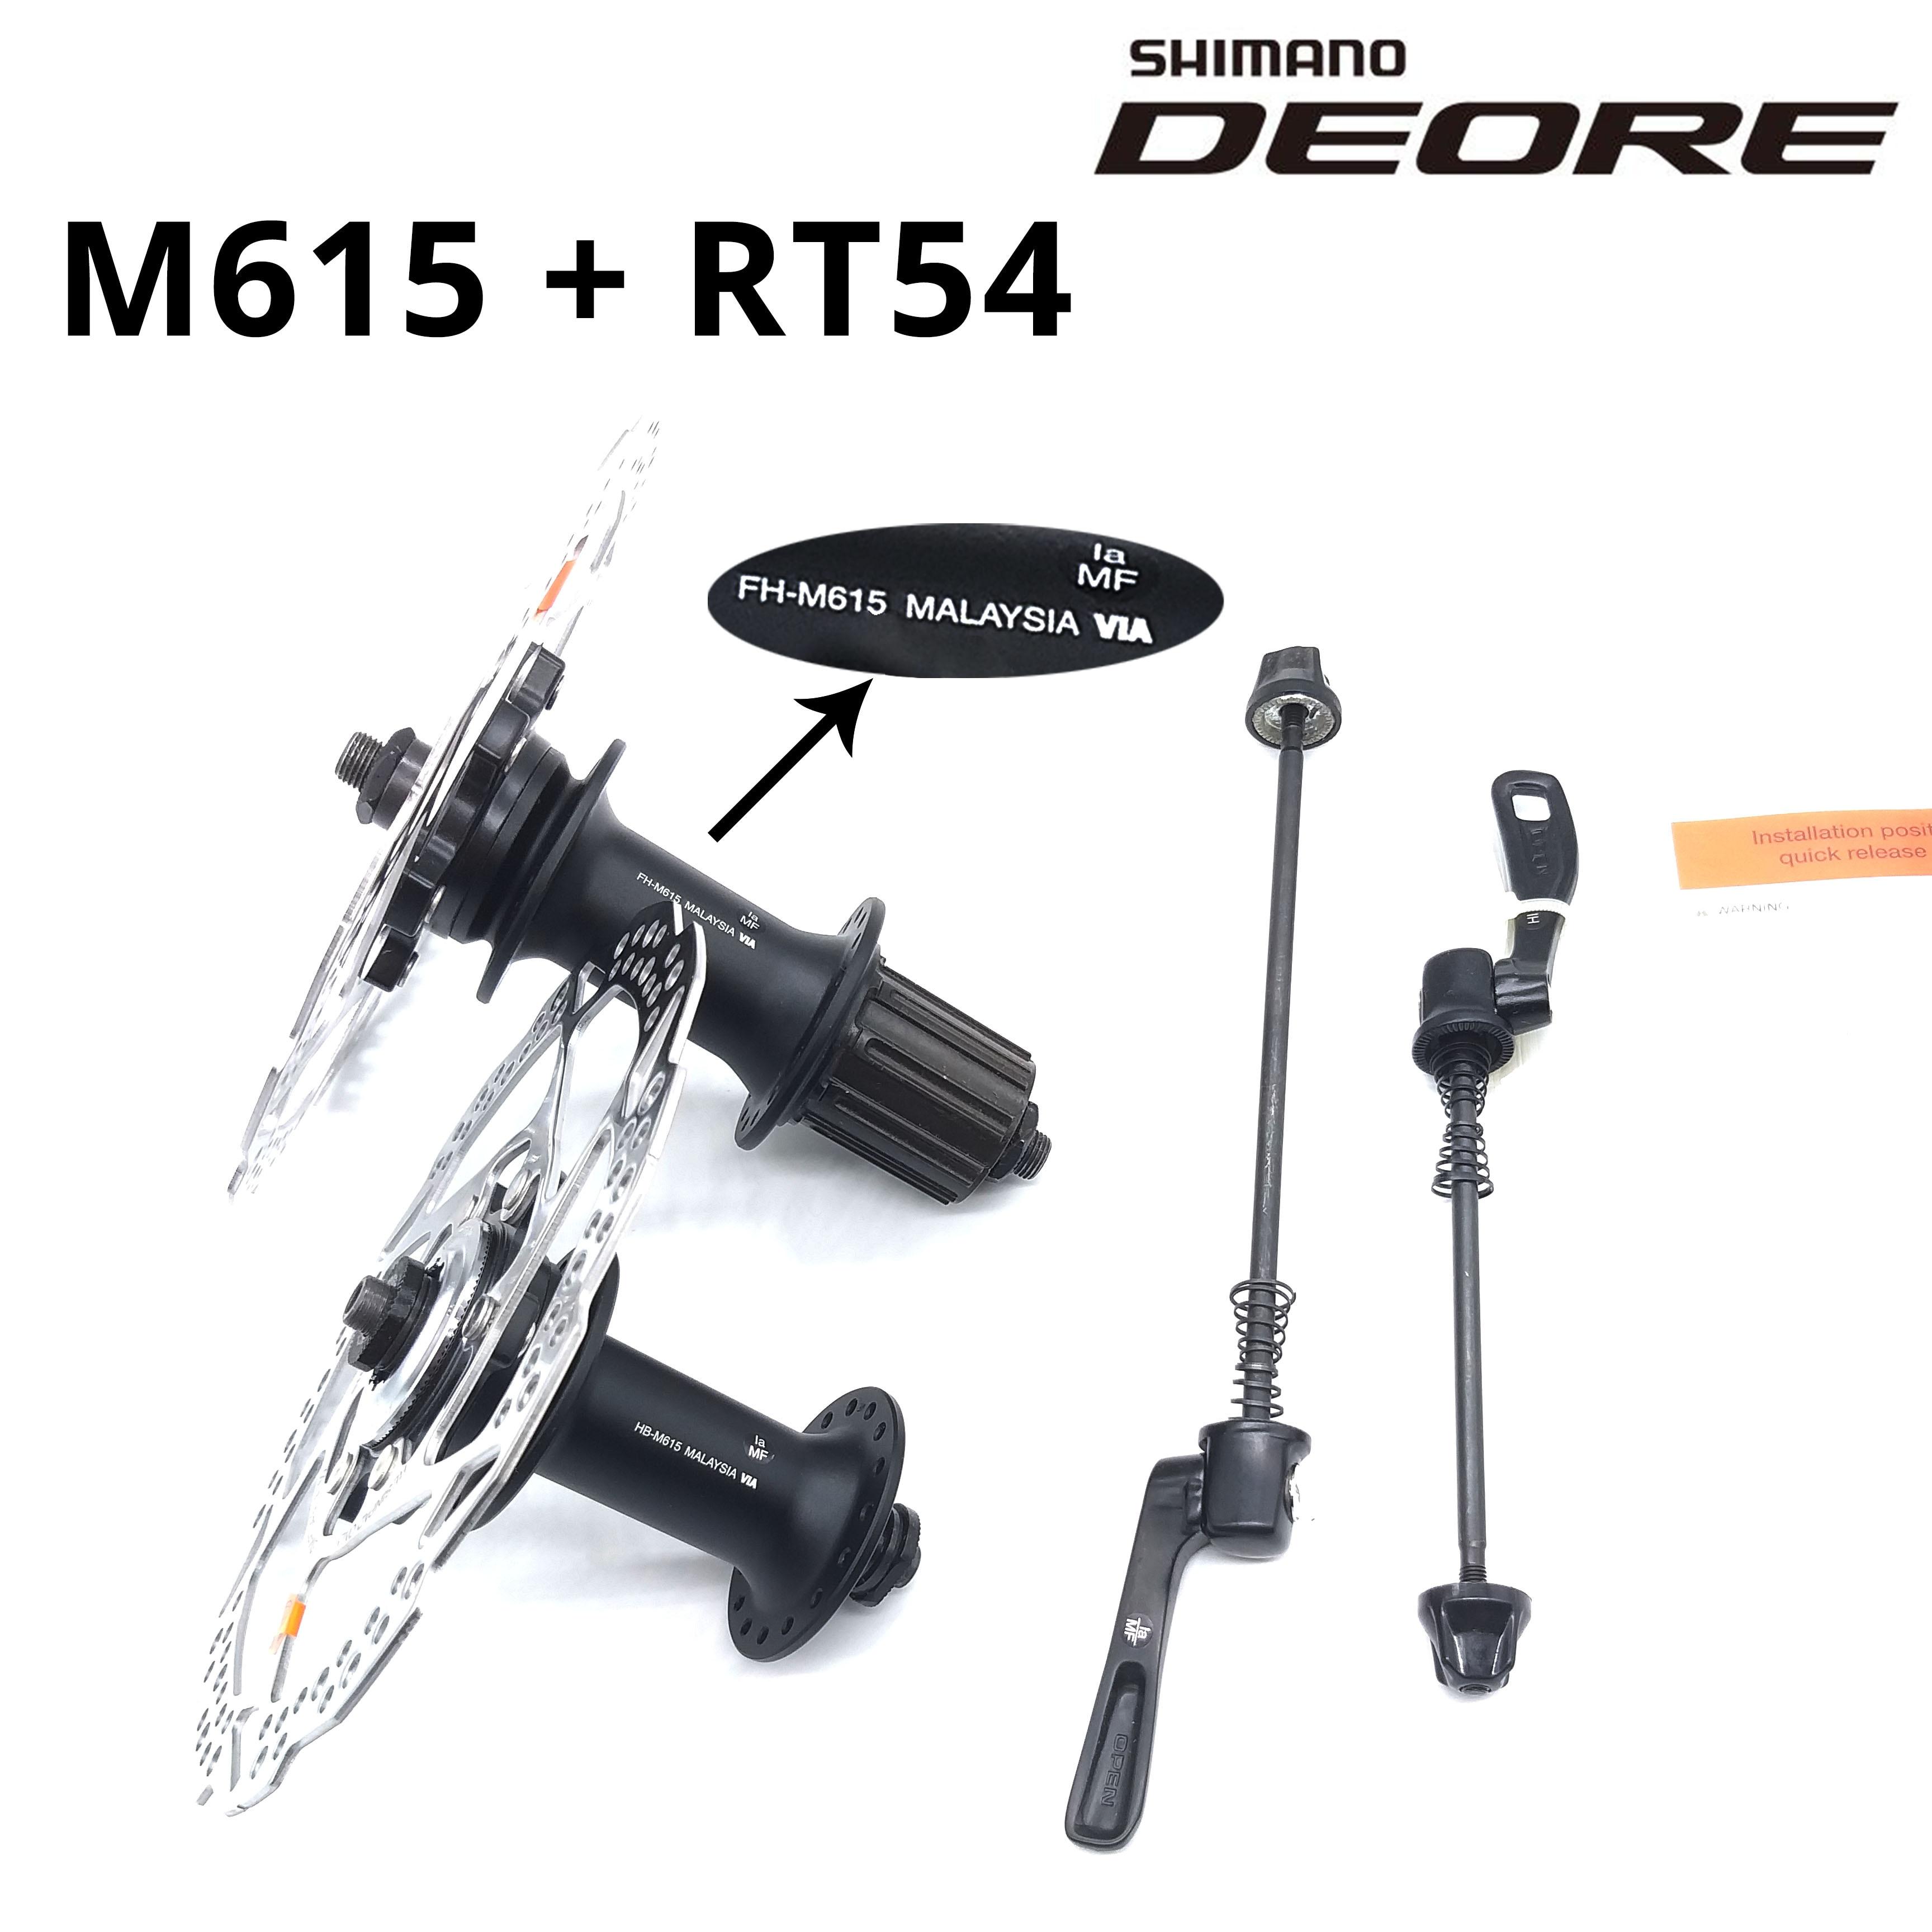 SHIMANO DEORE M525-SL 8//9-SPEED SHIMANO FREEHUB BODY